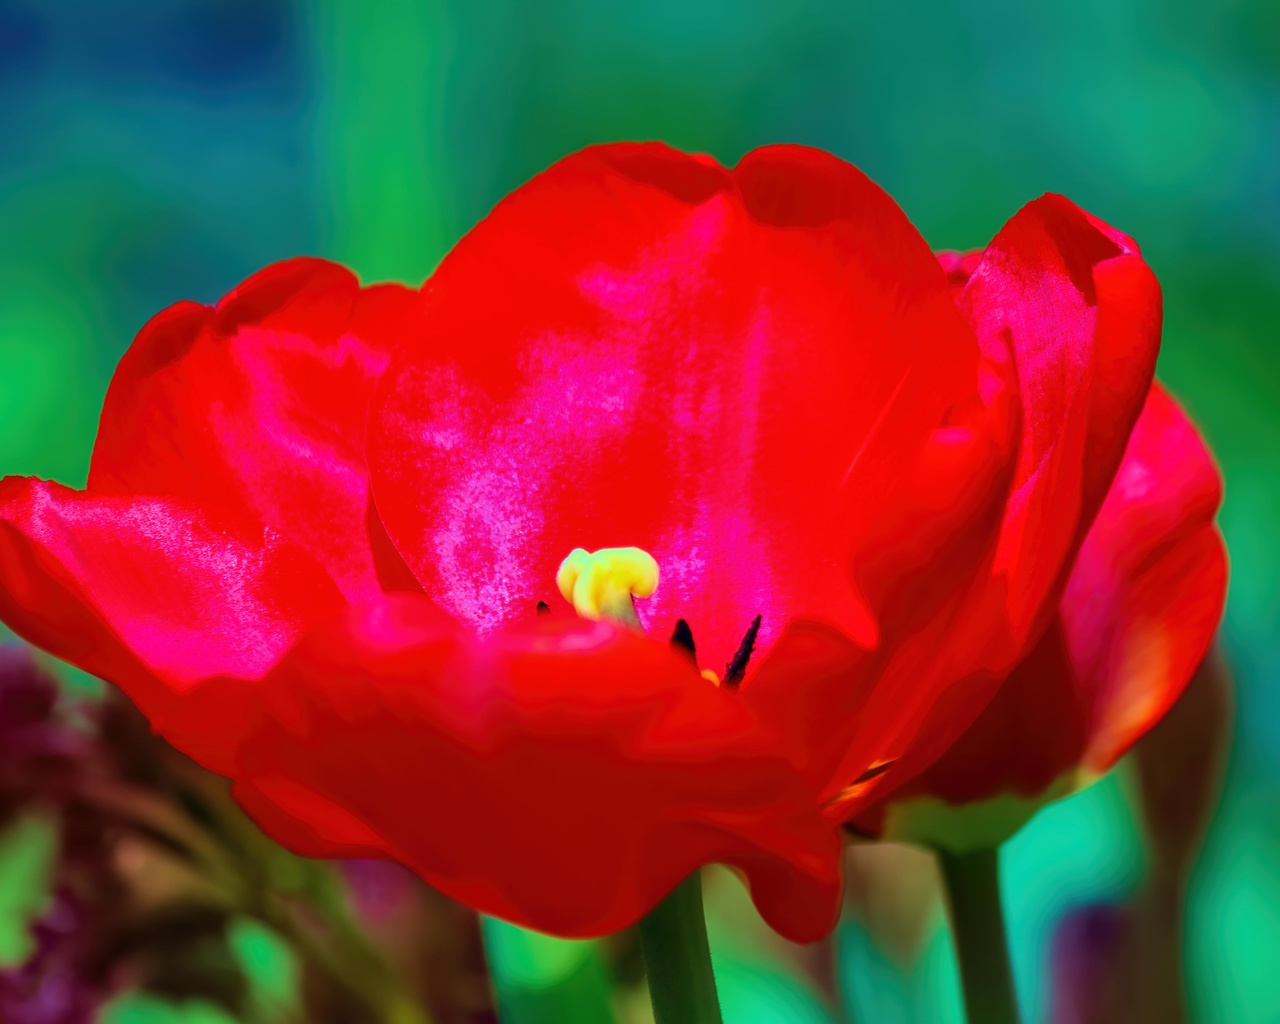 тюльпан, весна, цветок, лепестки